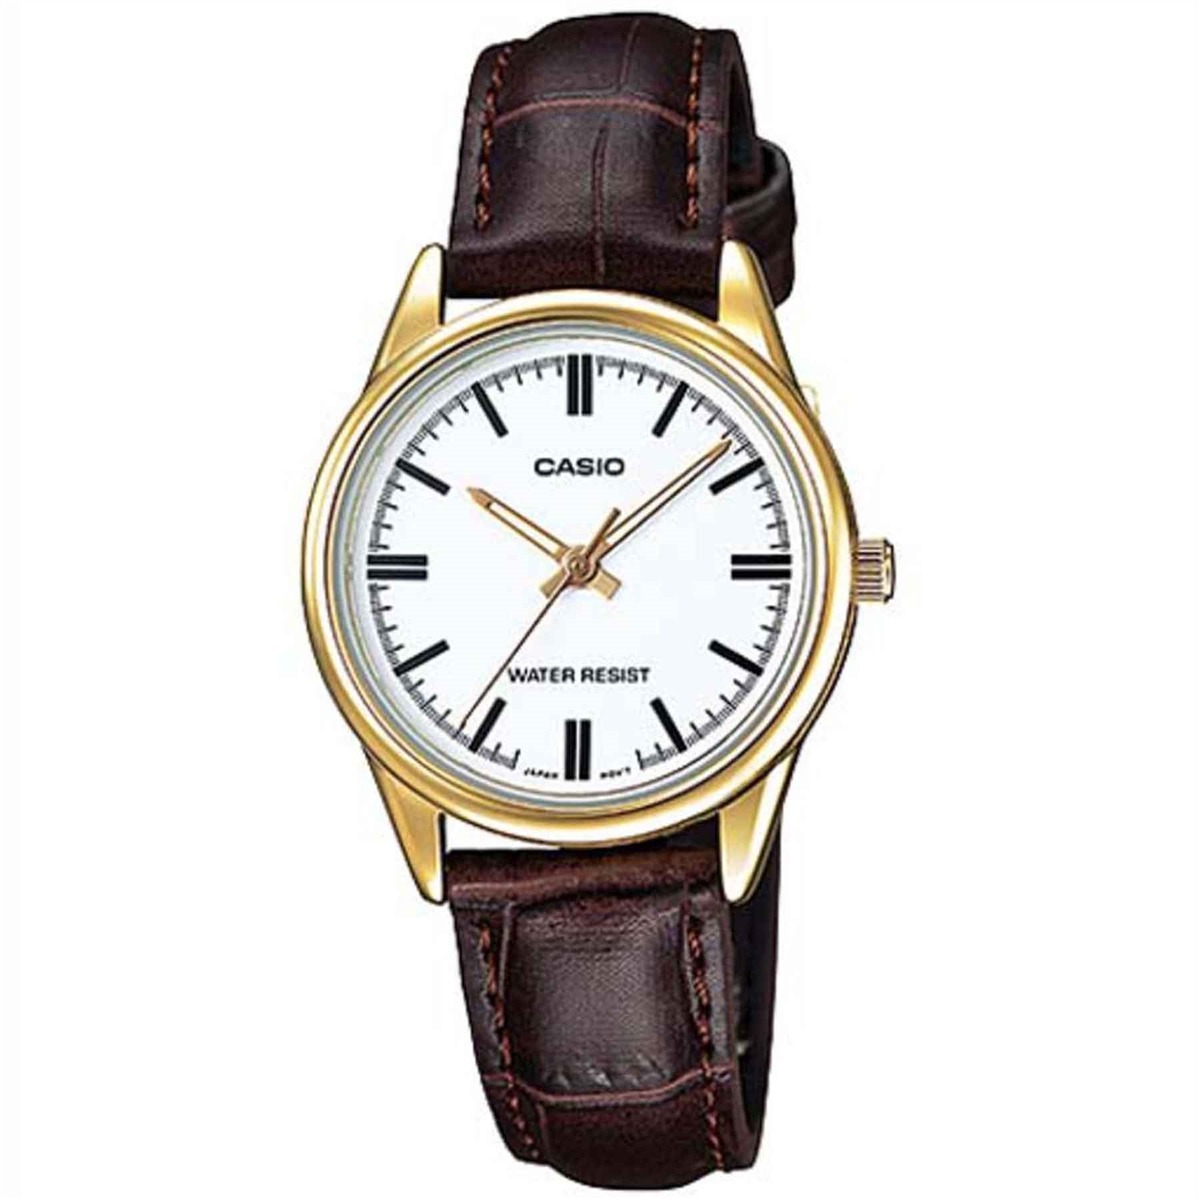 dd037f3c3c0 relógio casio collection analógico feminino ltp-v005gl-7a. Carregando zoom.